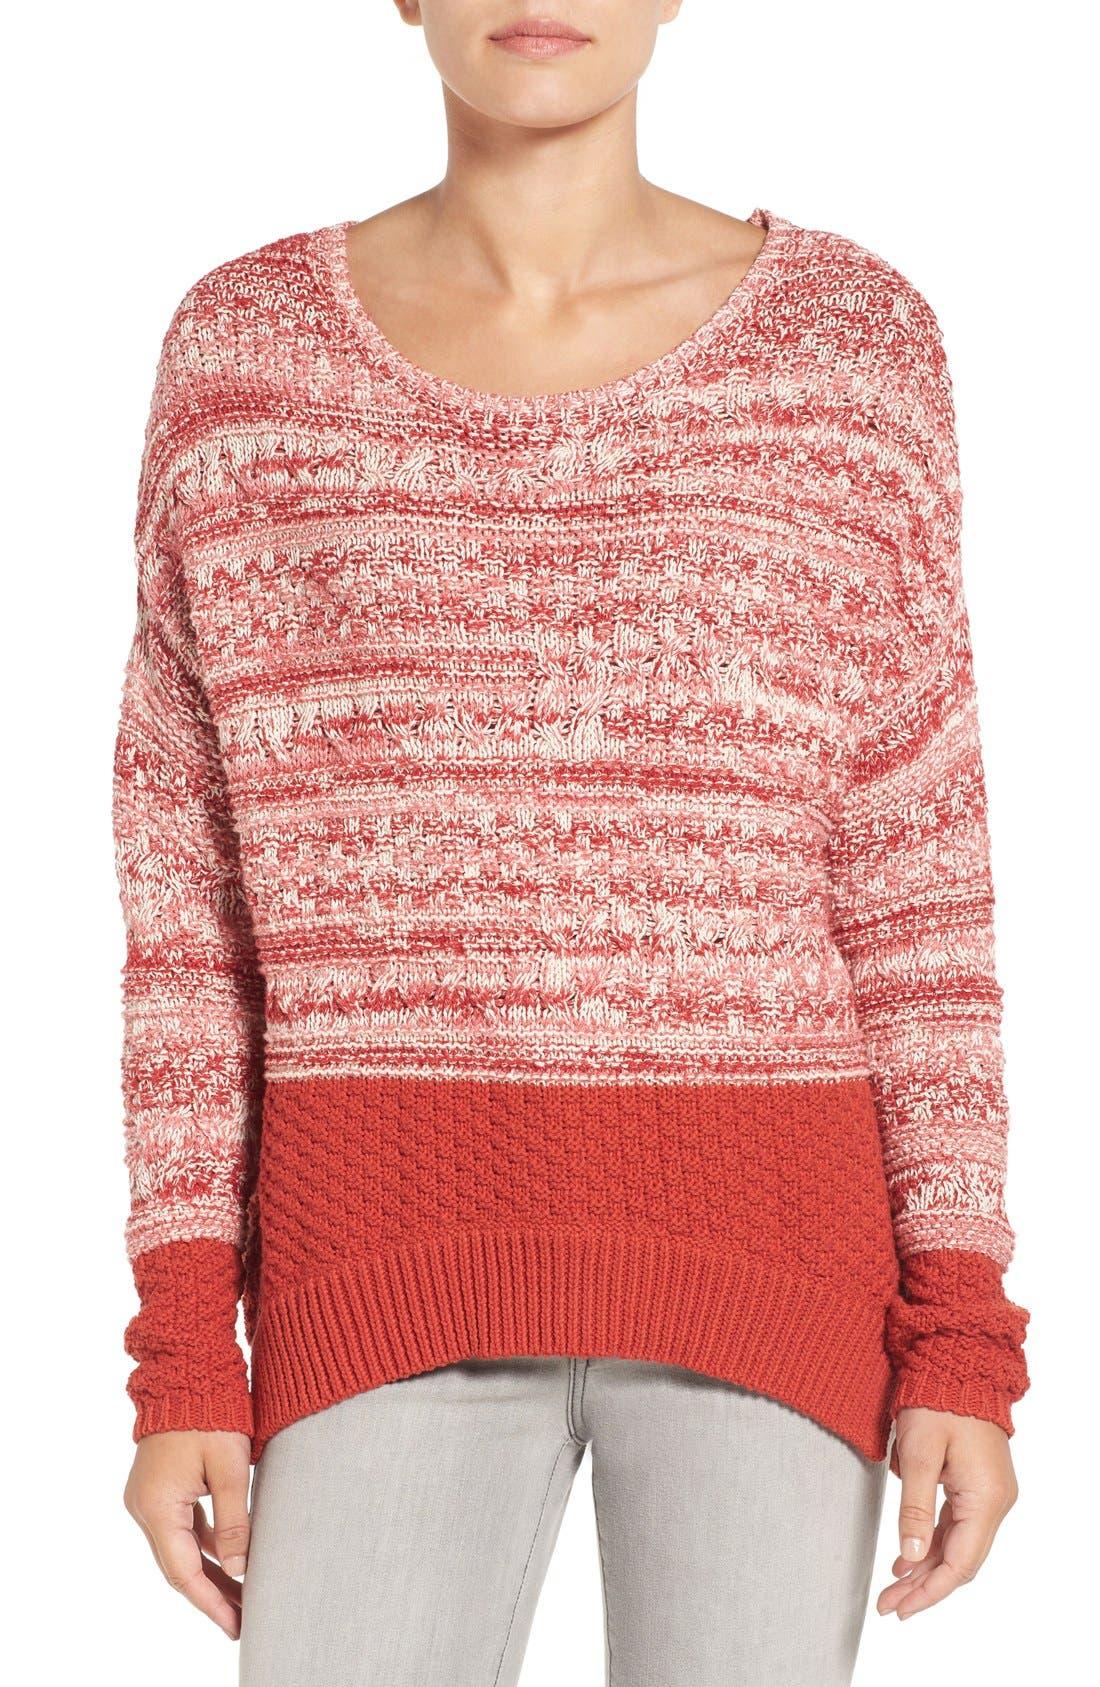 Alternate Image 1 Selected - Caslon® Colorblock Marl Knit Sweater